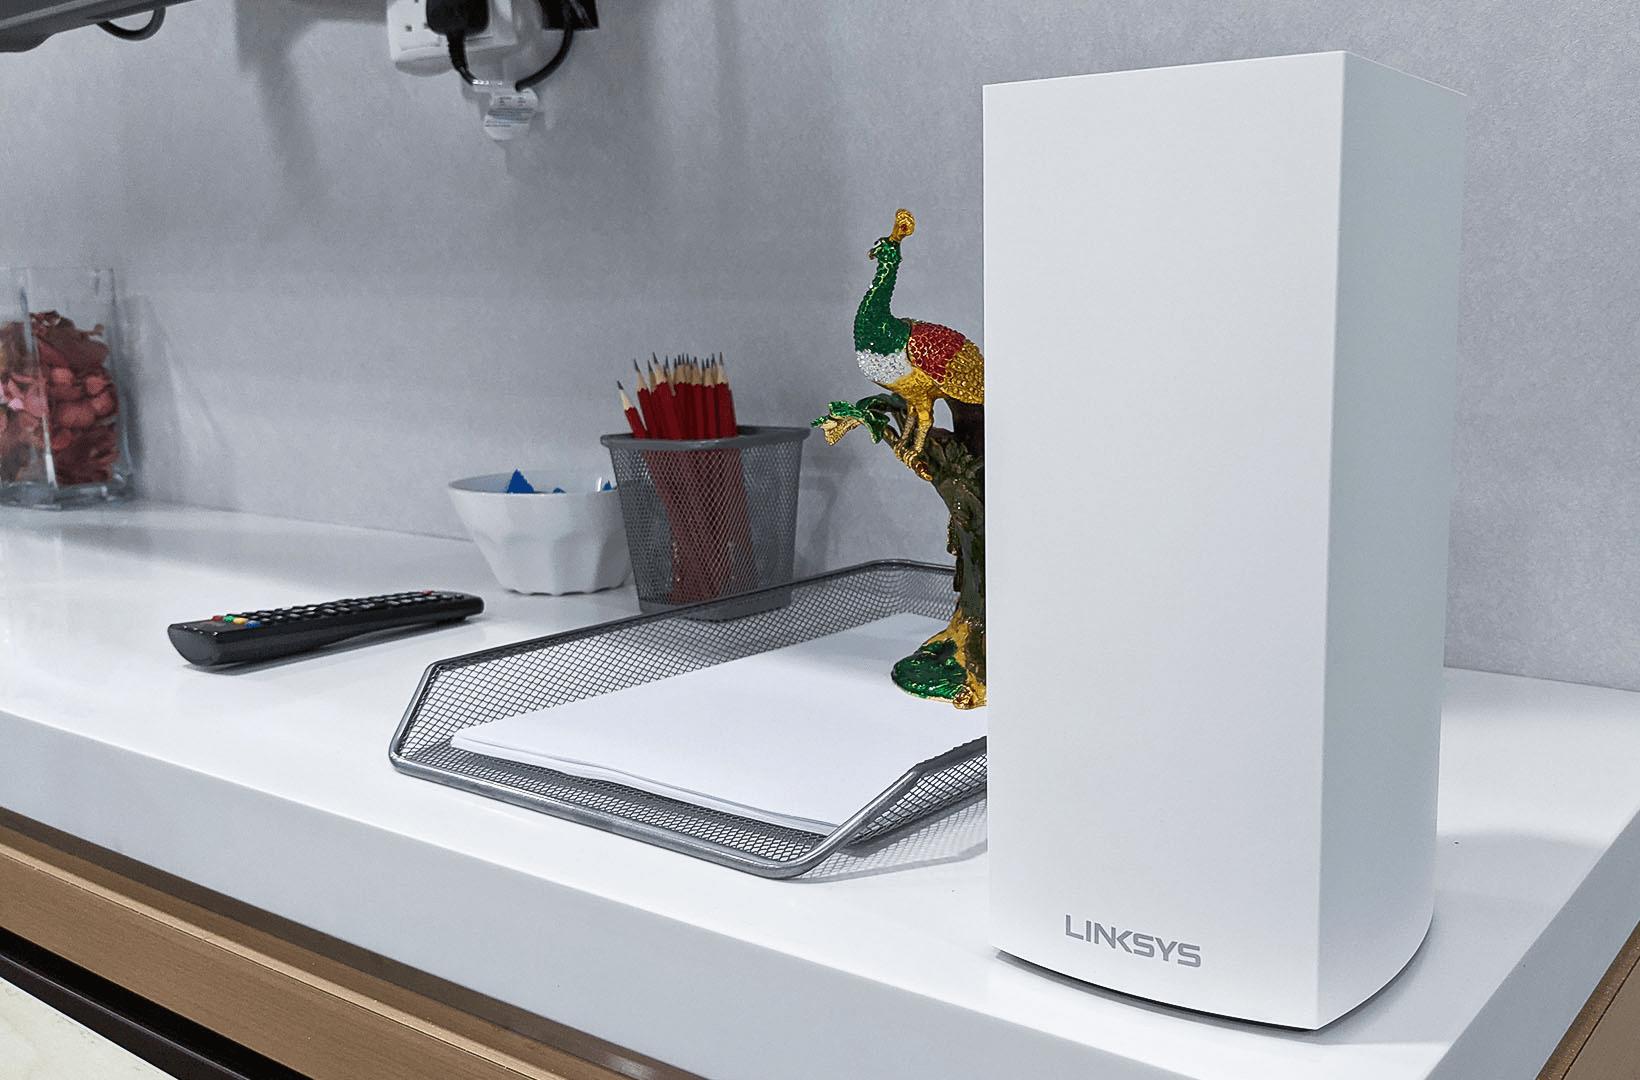 Starhub Smart WiFi Pro Linksys